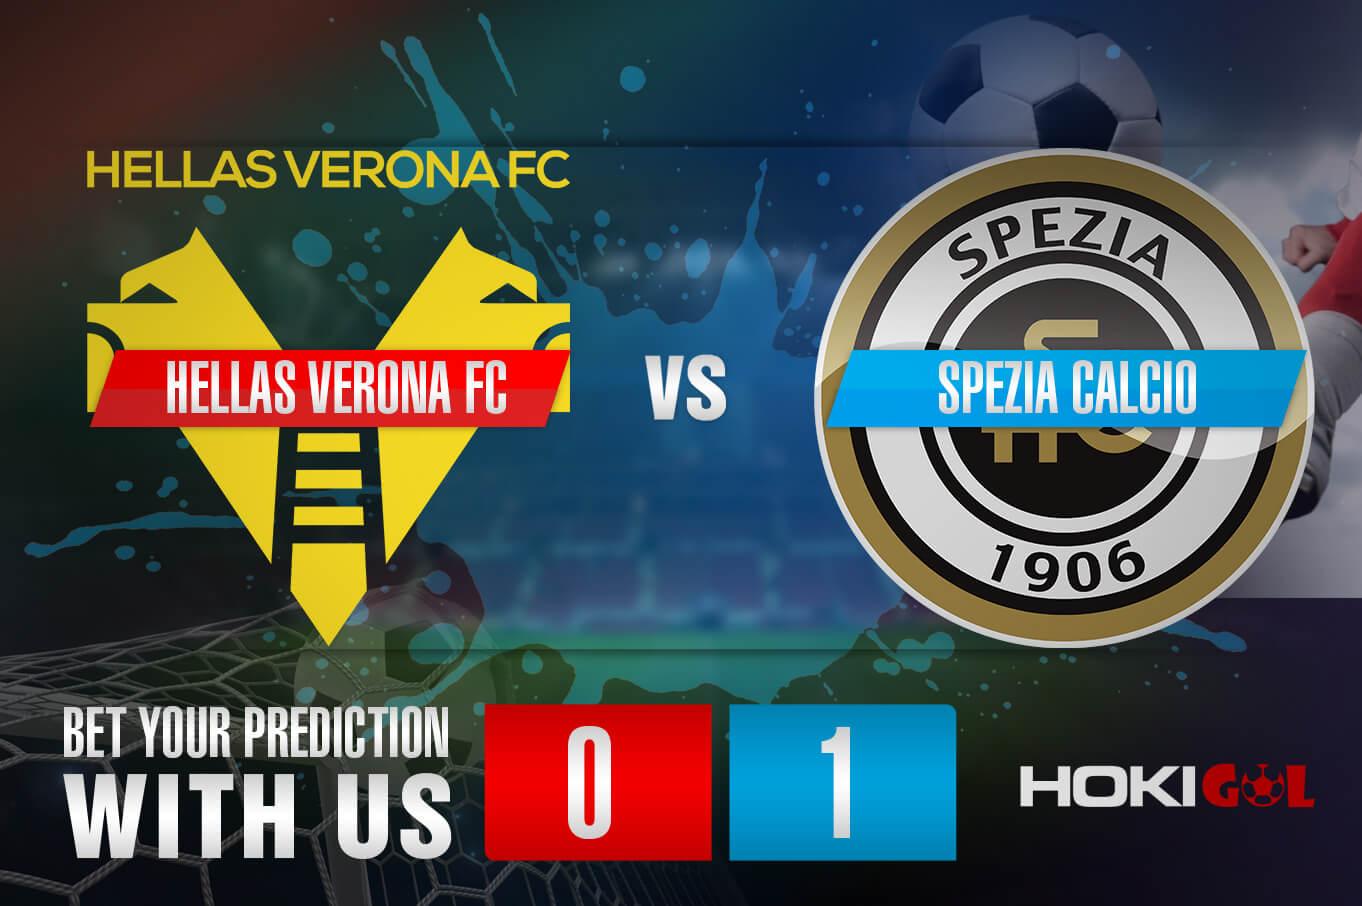 Prediksi Bola Hellas Verona FC Vs Spezia Calcio 1 Mei 2021